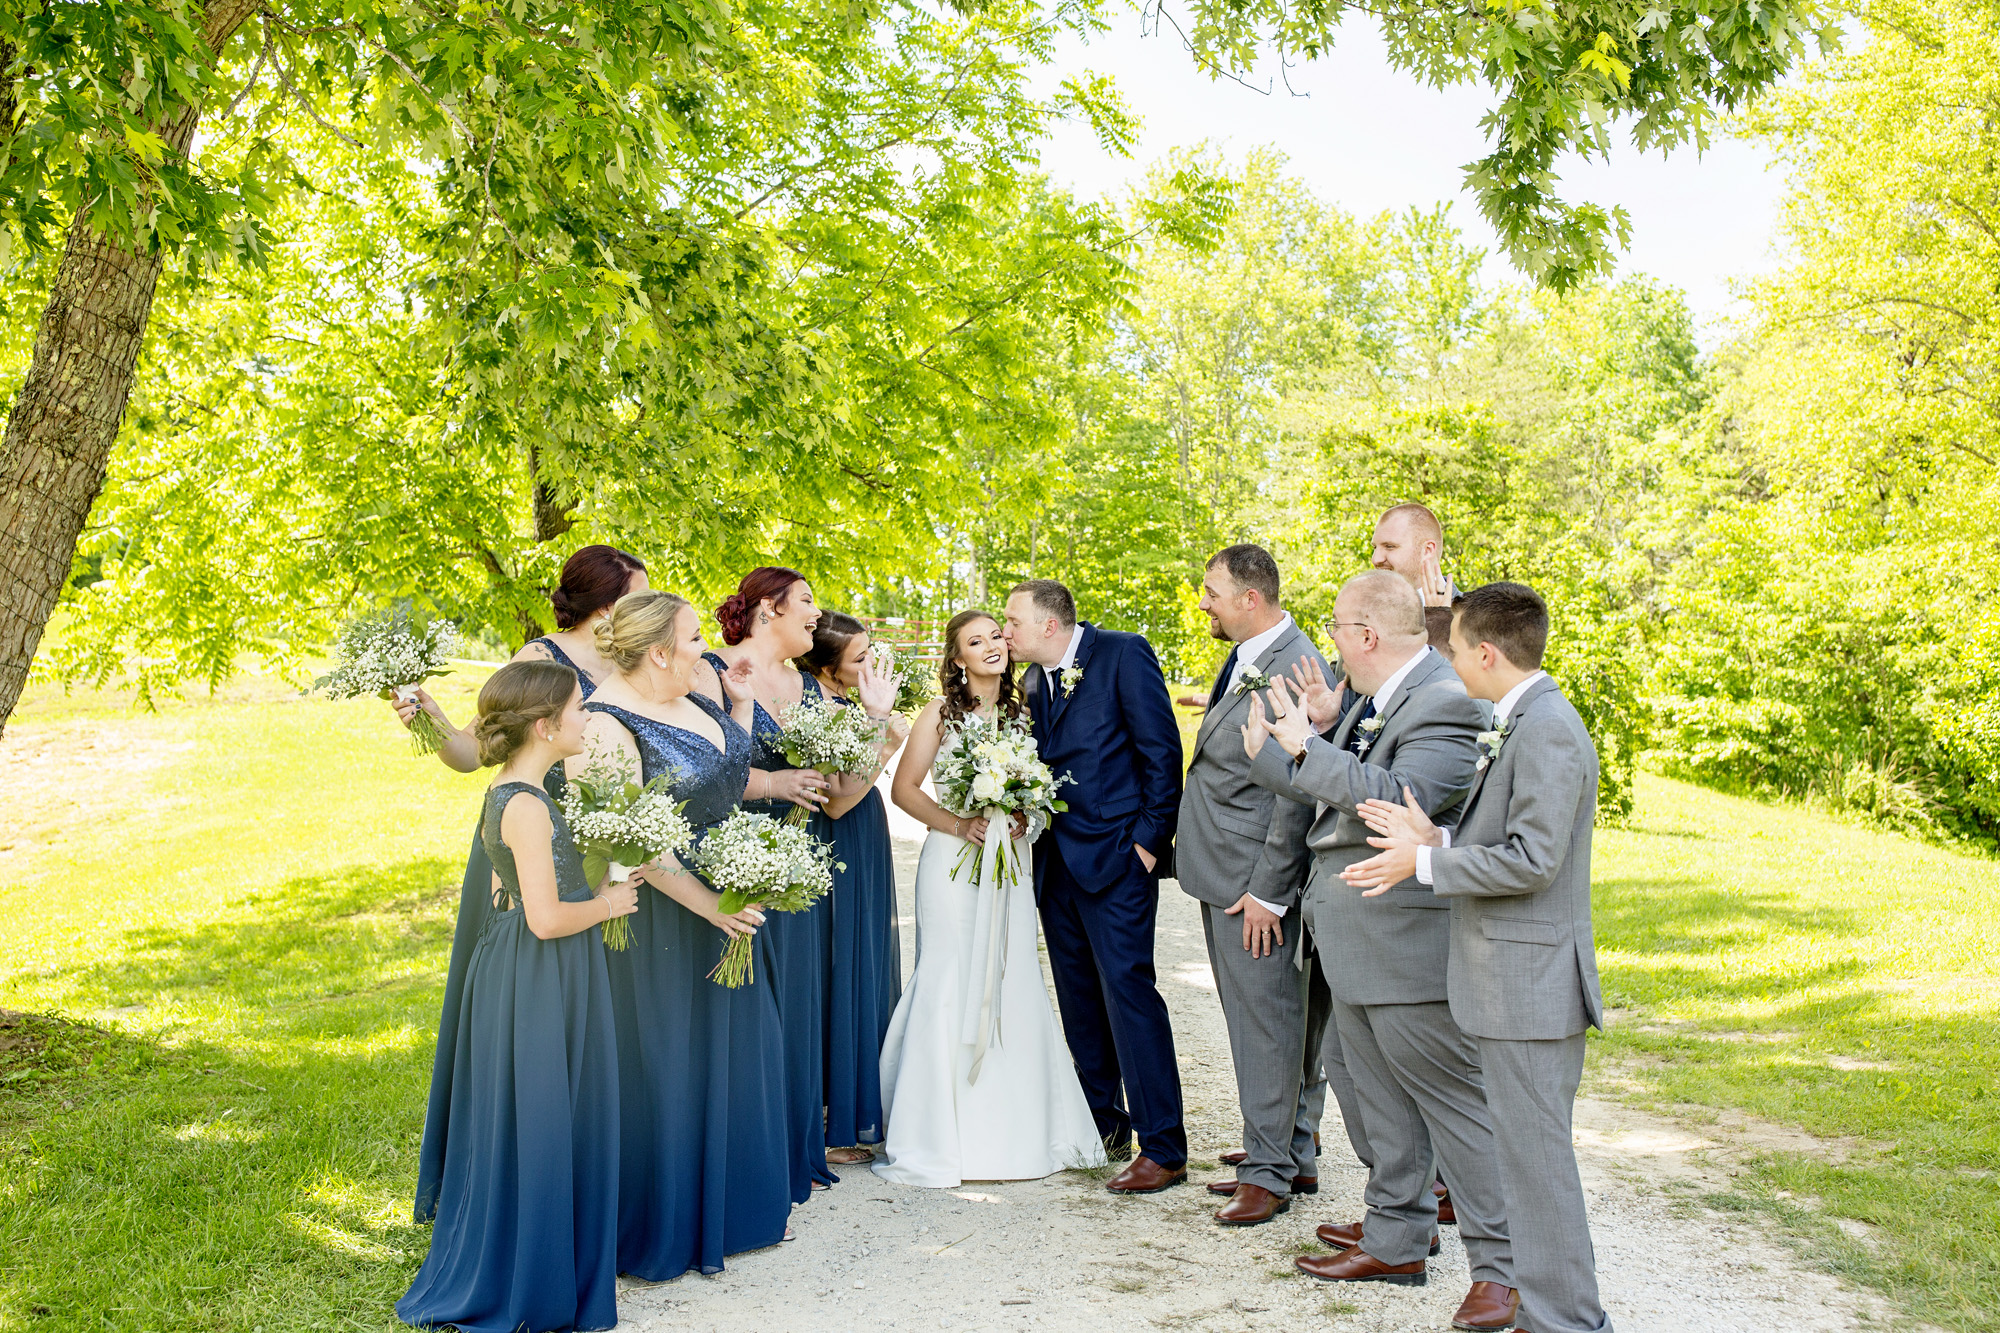 Seriously_Sabrina_Photography_Red_River_Gorge_Wedding_Barn_Robinson50.jpg